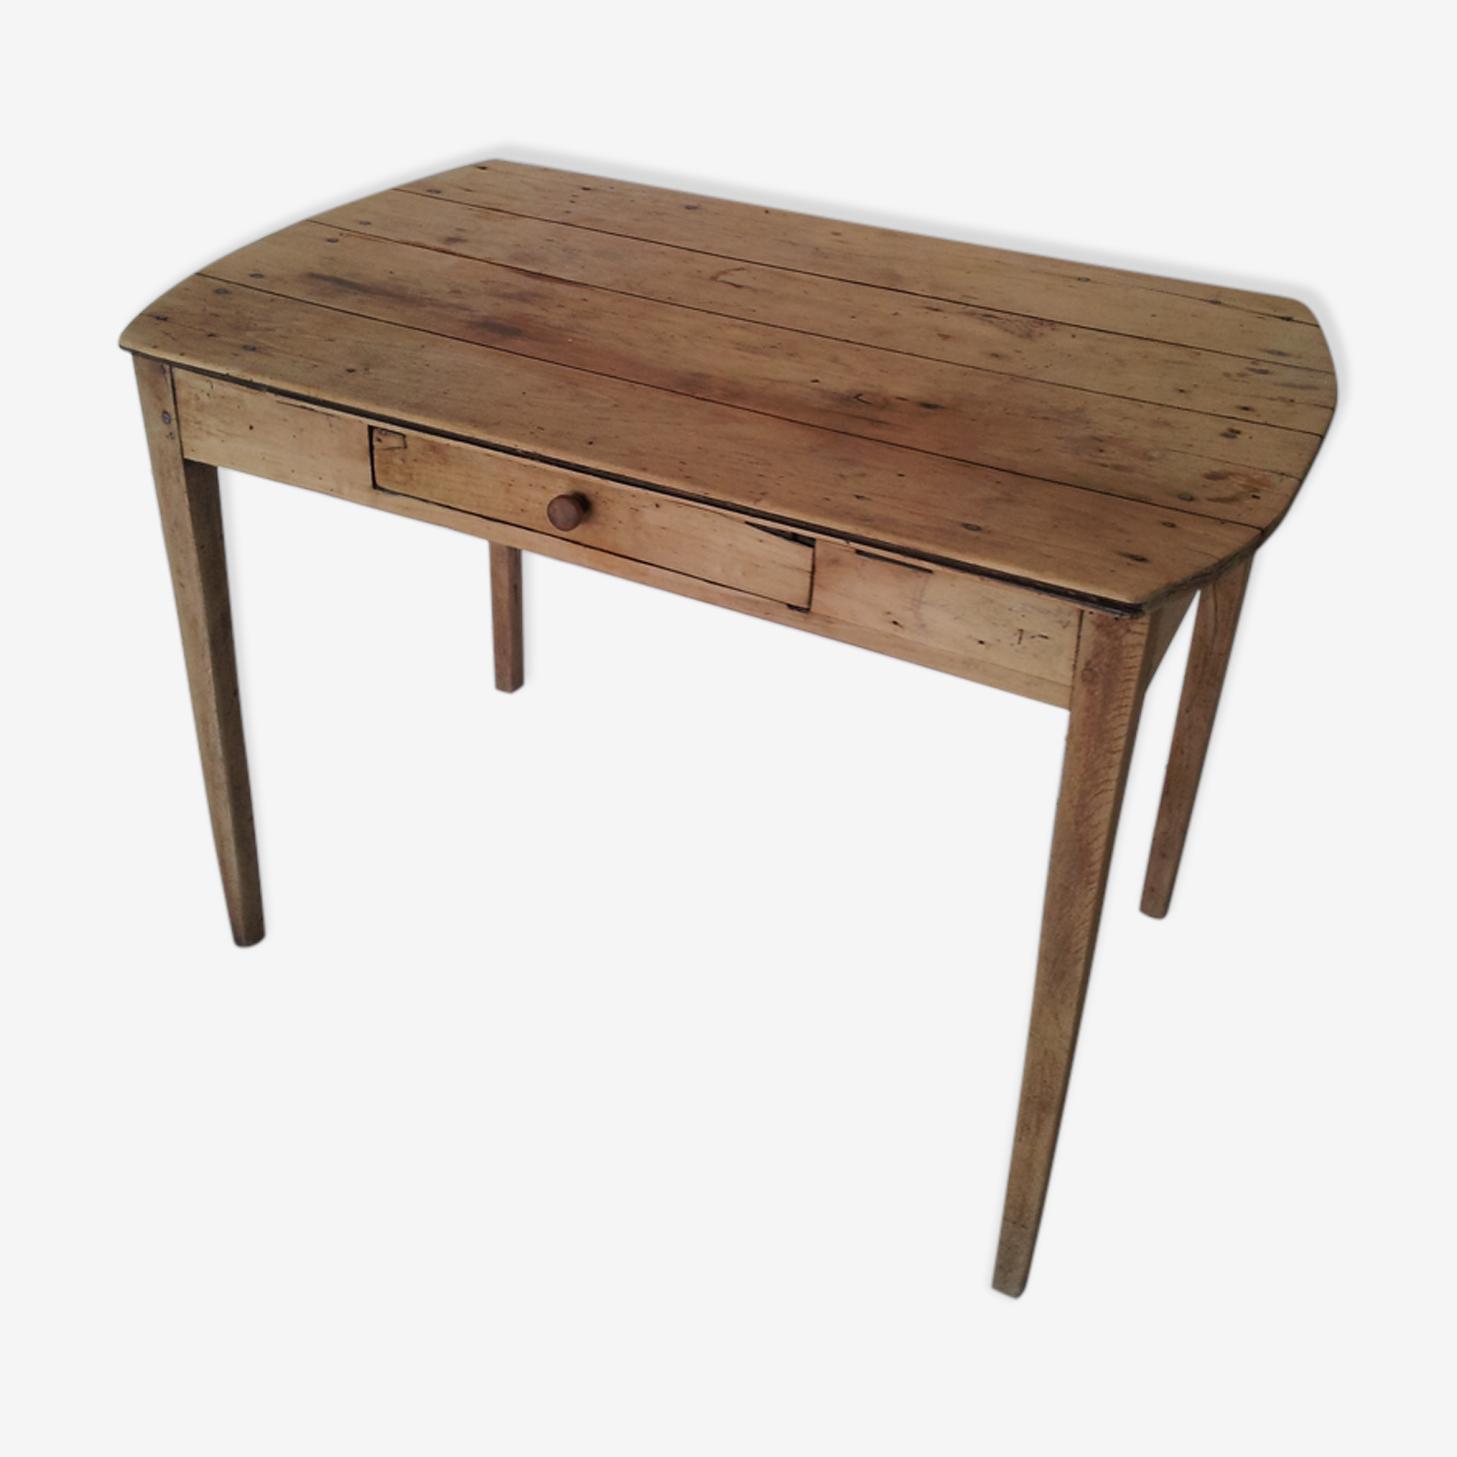 Table bois 1950 avec 1 tiroir et 2 rallonges